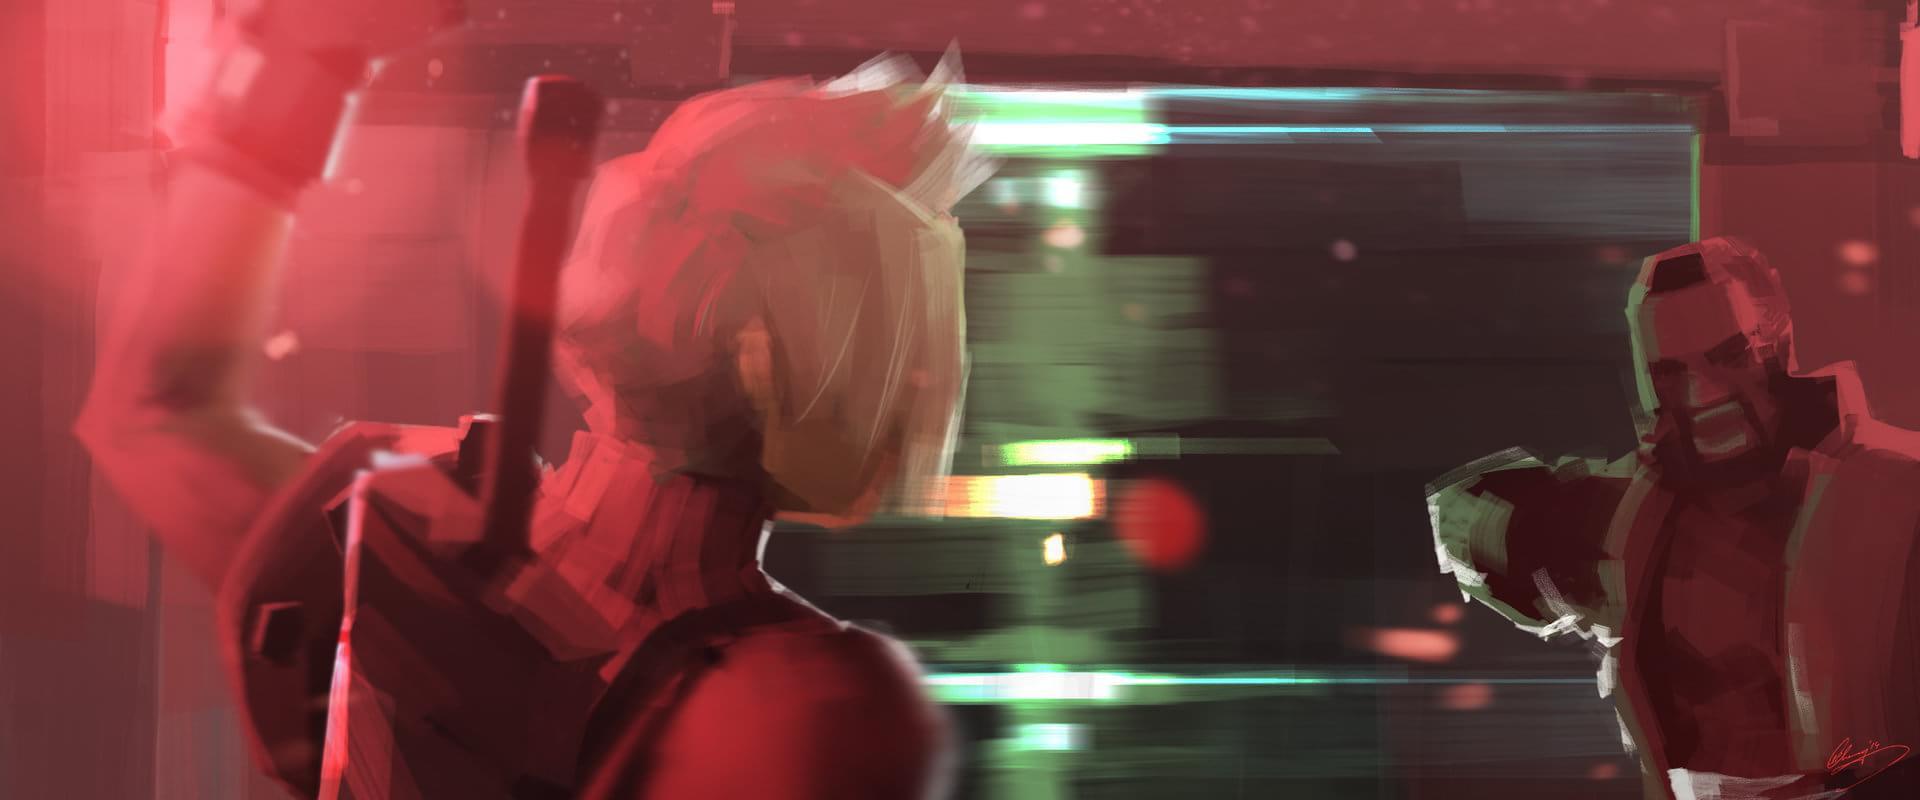 Pinturas recriam momentos memoráveis de Final Fantasy VII [galeria]